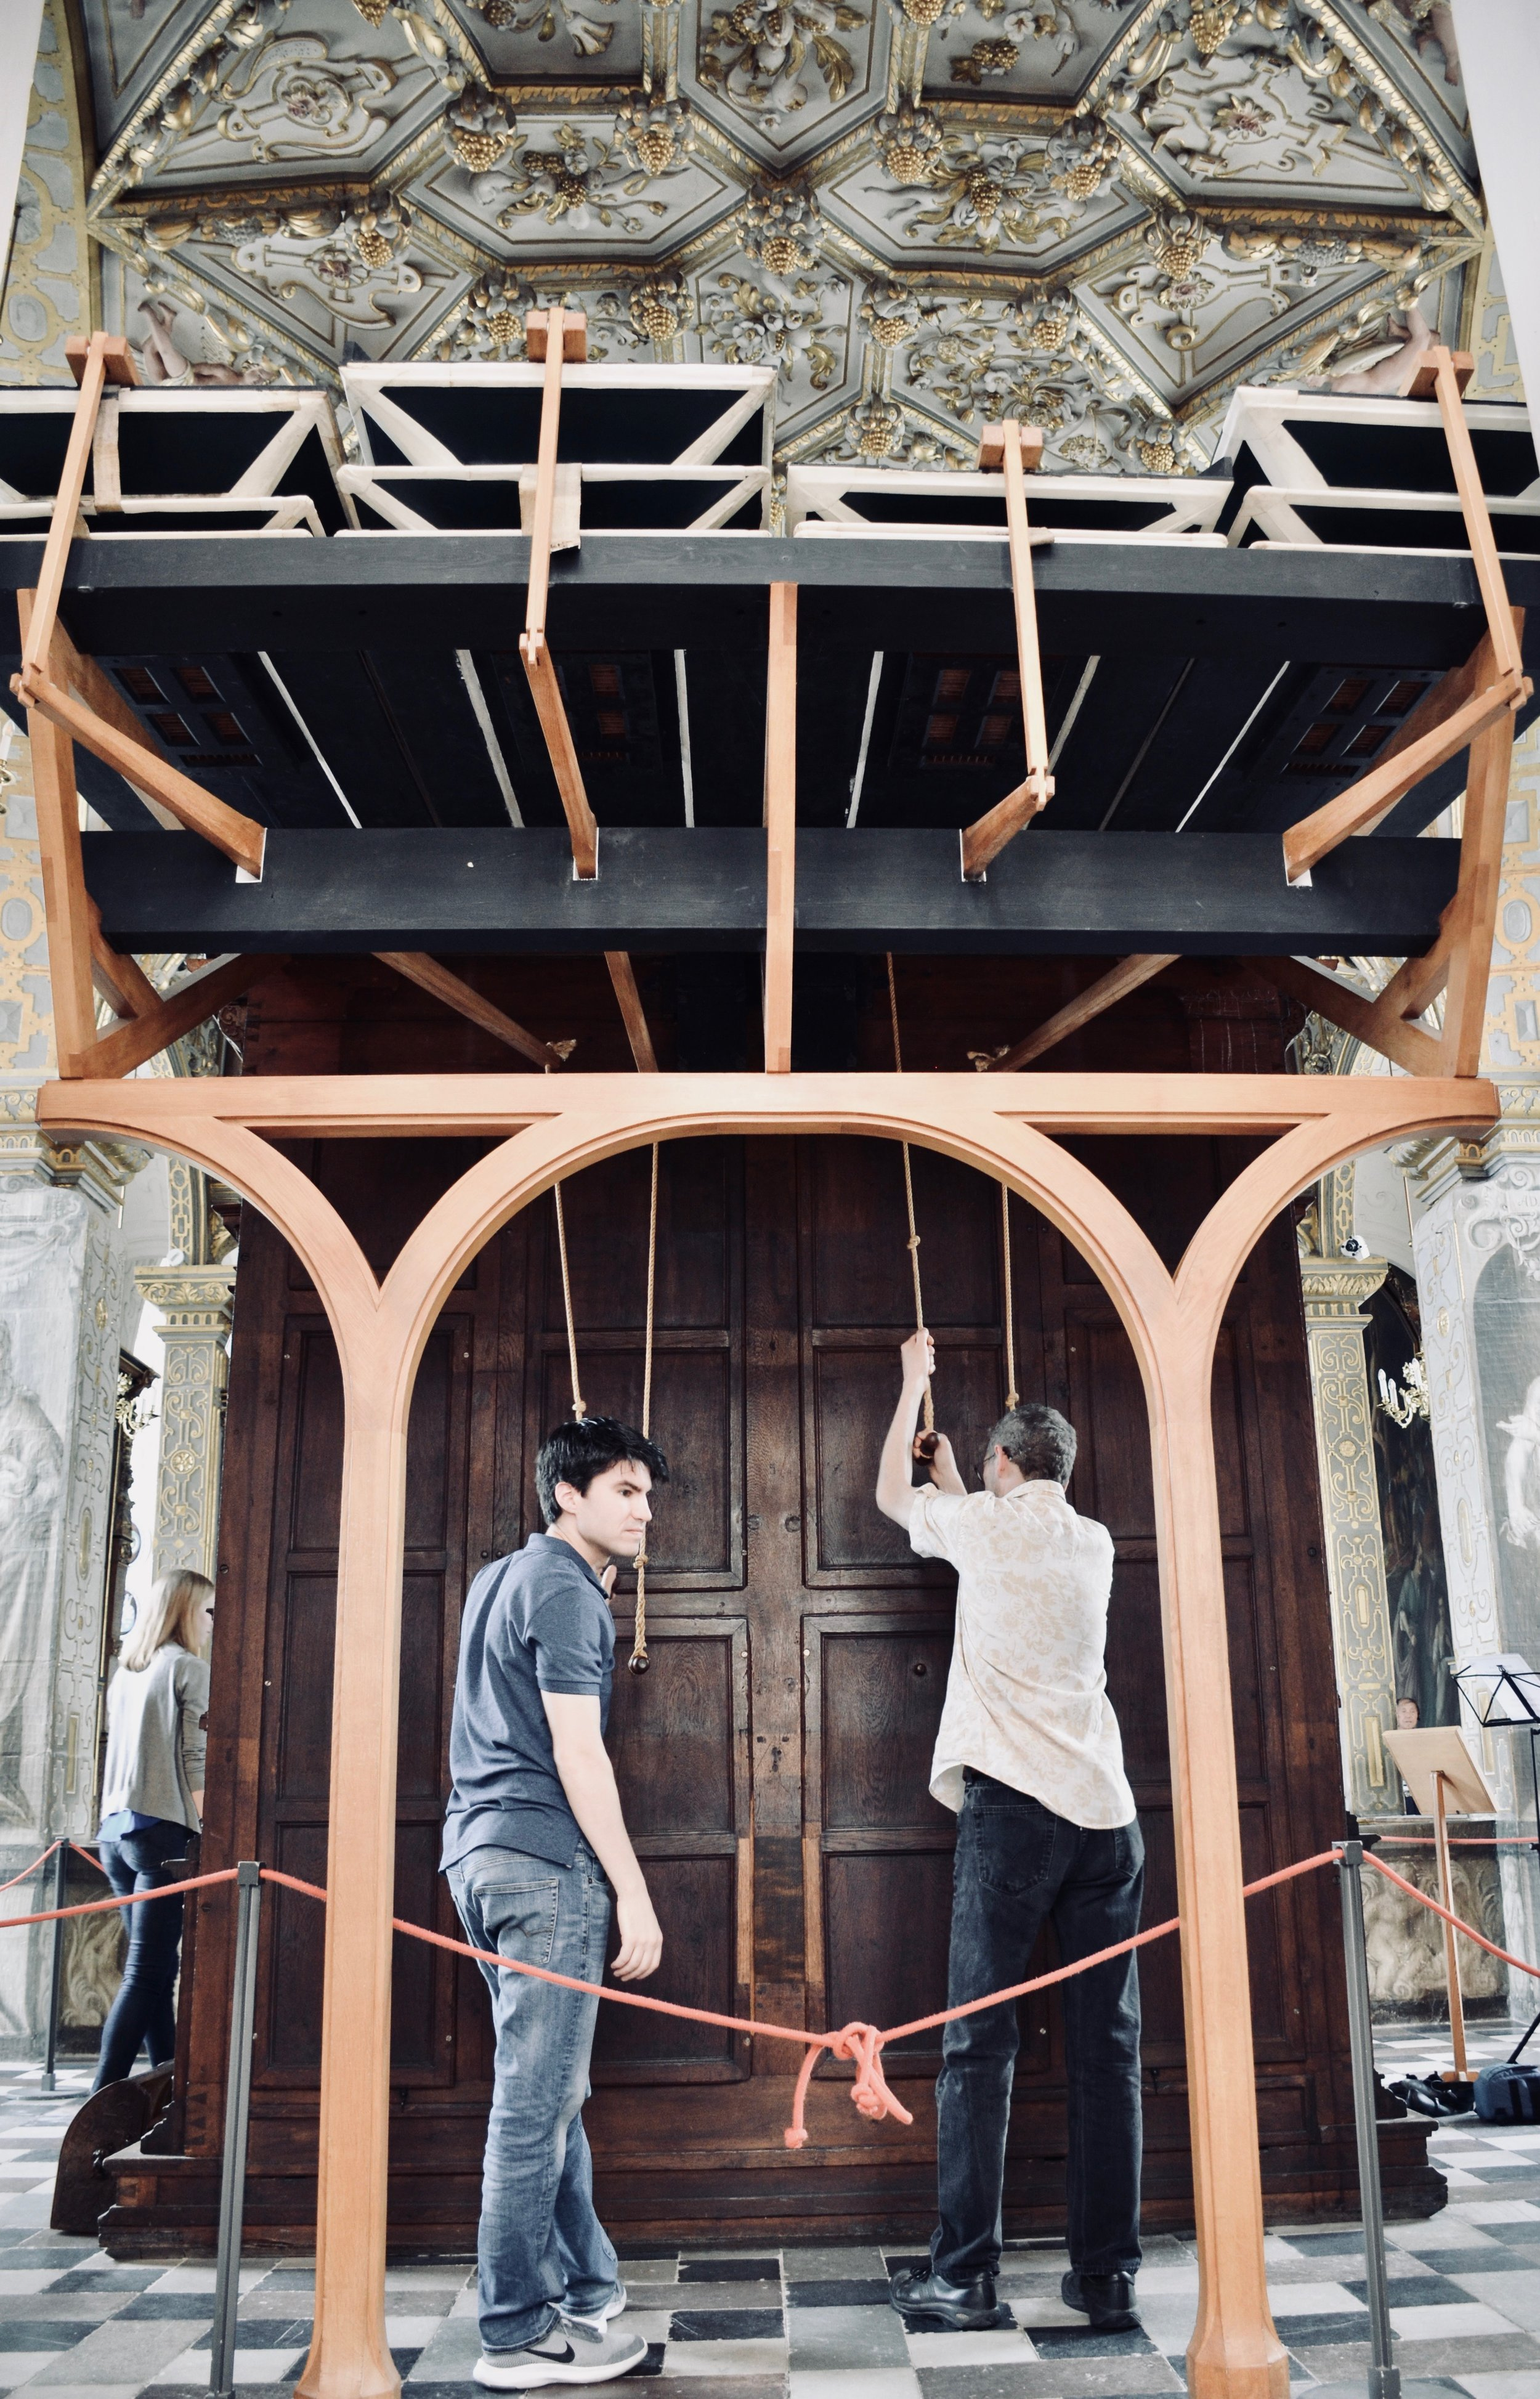 Brandon Santini and Chris Porter pump the bellows, 1610 Compenius organ, Frederiksborg Castle, Hillerød, Denmark.